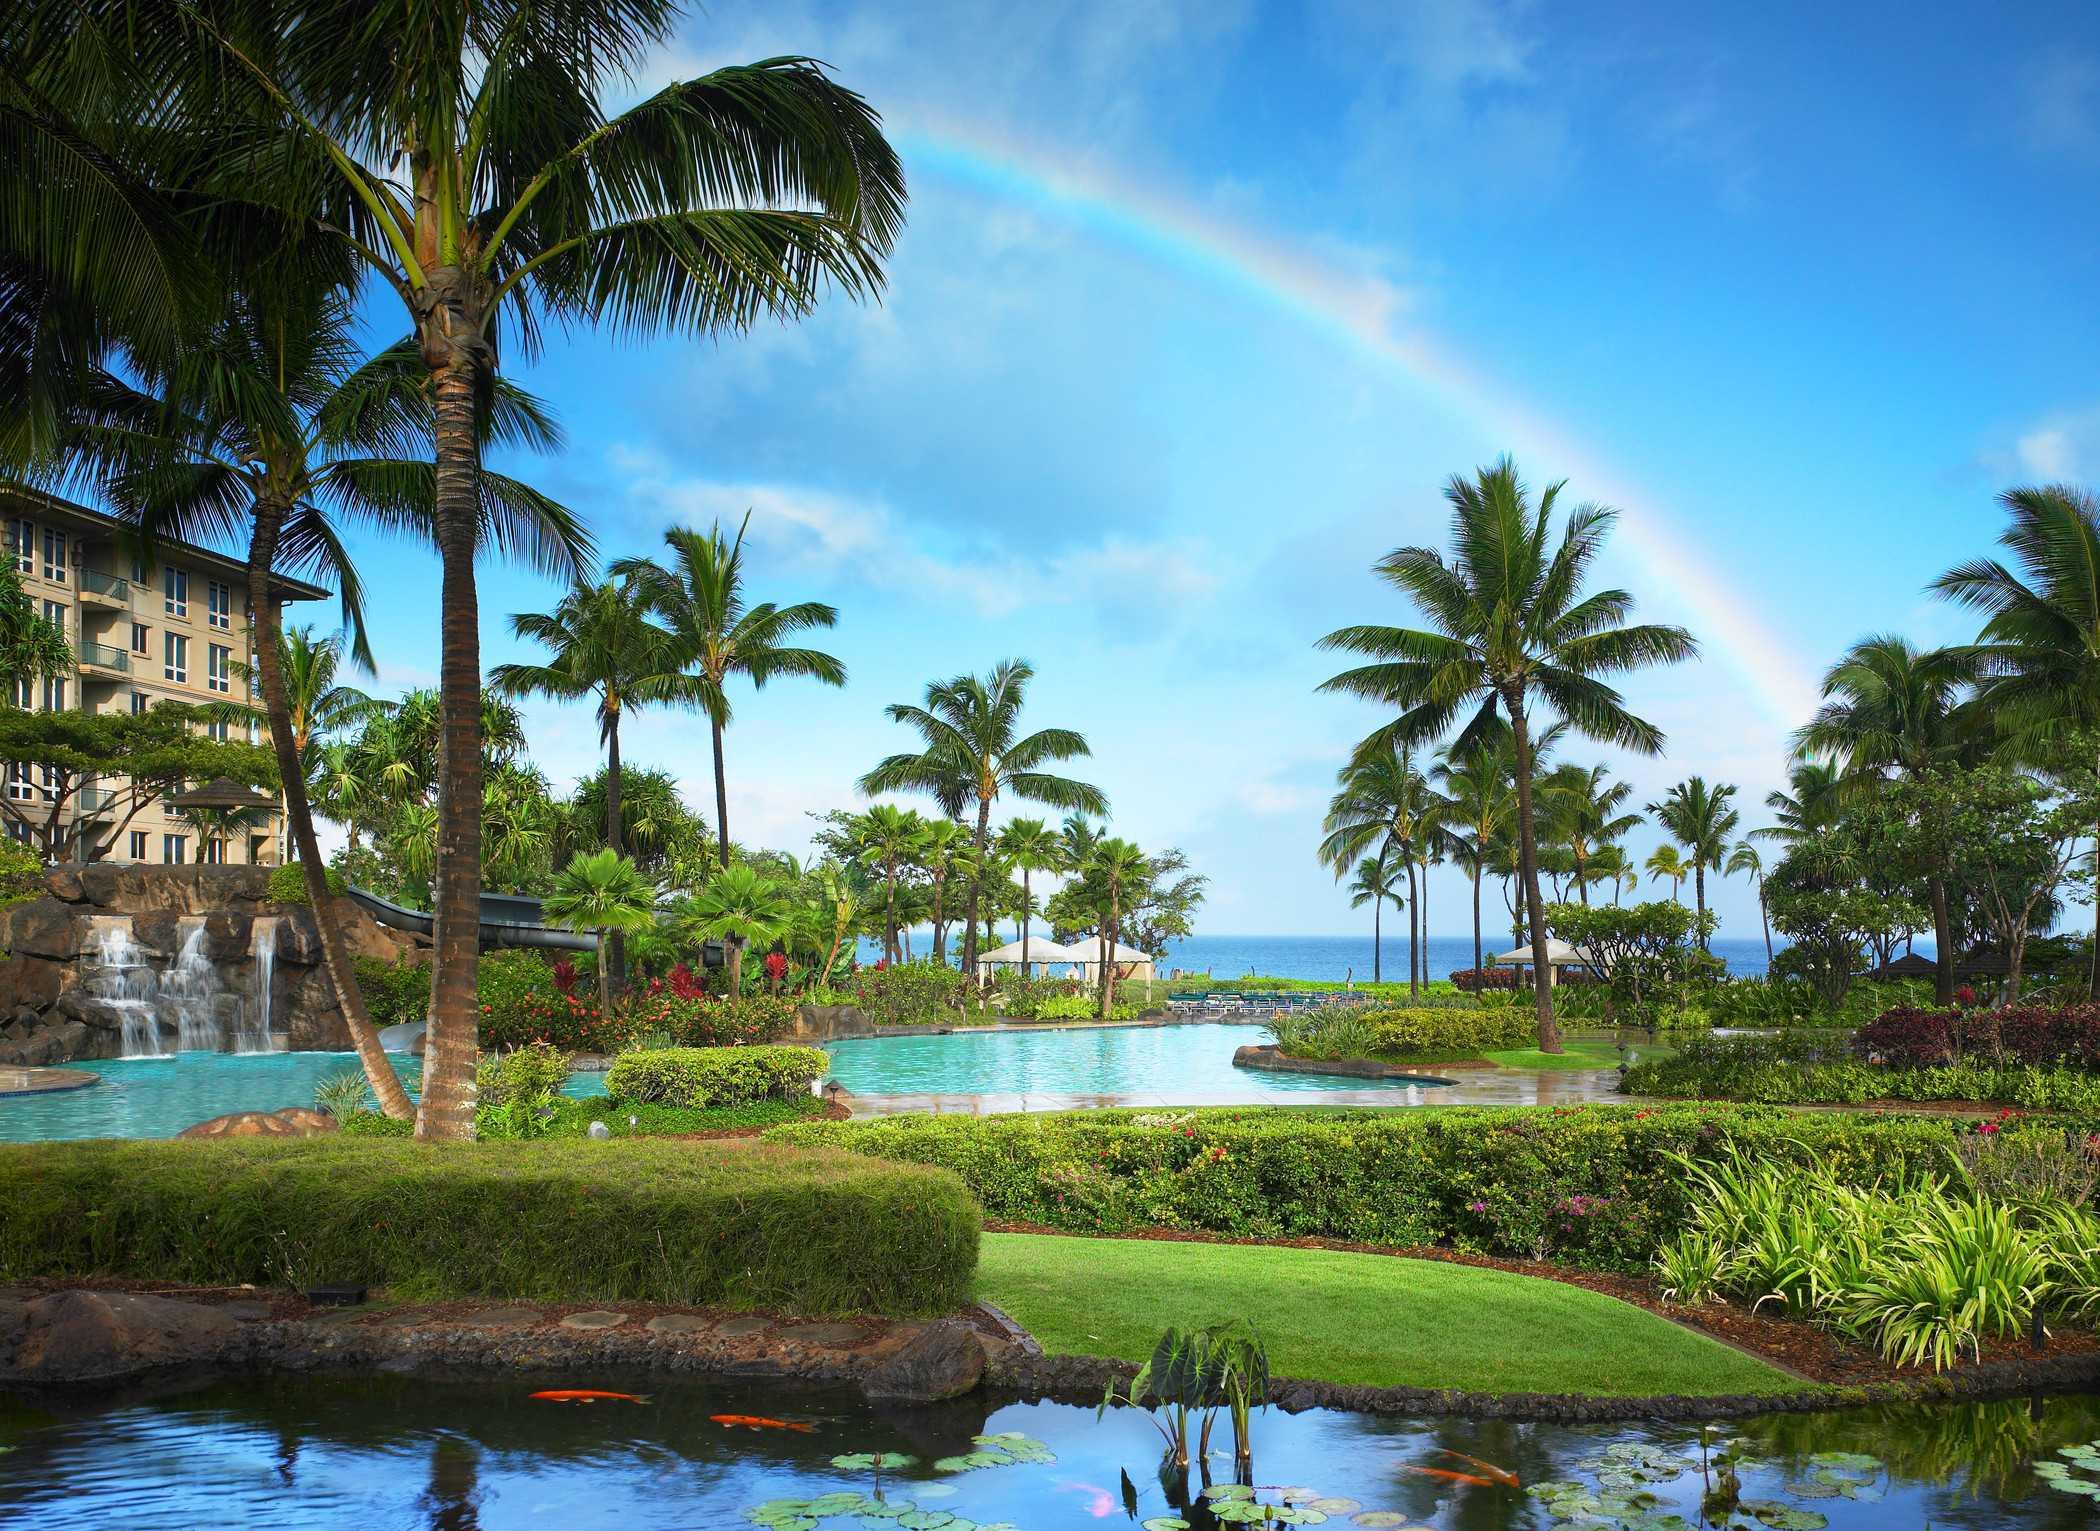 Westin Kaanapali Ocean Resort Villas Review And Reasons To Buy Resales